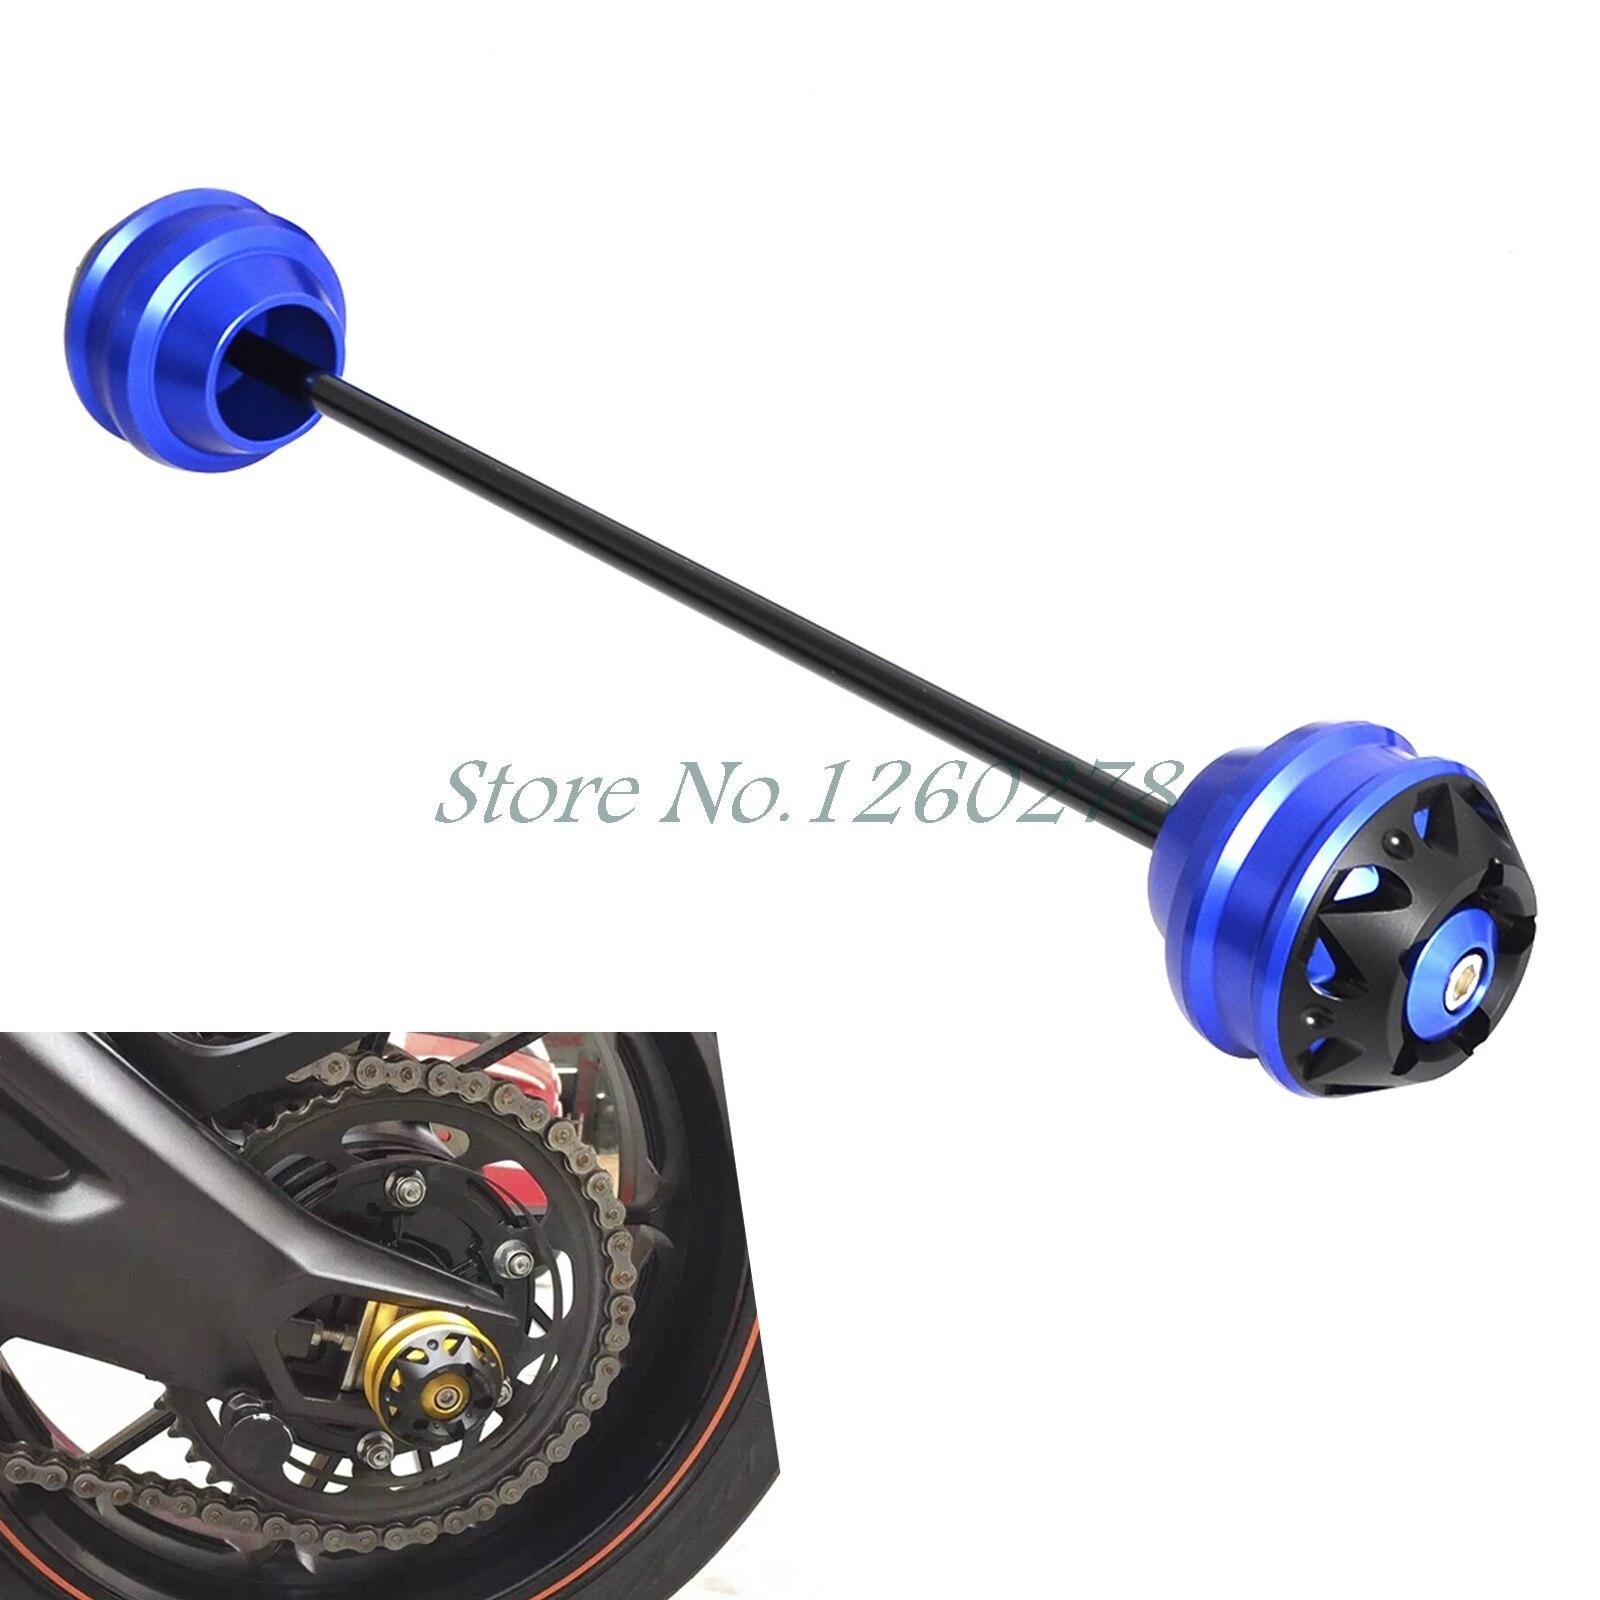 Front Axle Fork Crash Sliders Wheel Falling Protection Guard For BMW K1200 K1300 GT/R/S K1600 GT/GTL